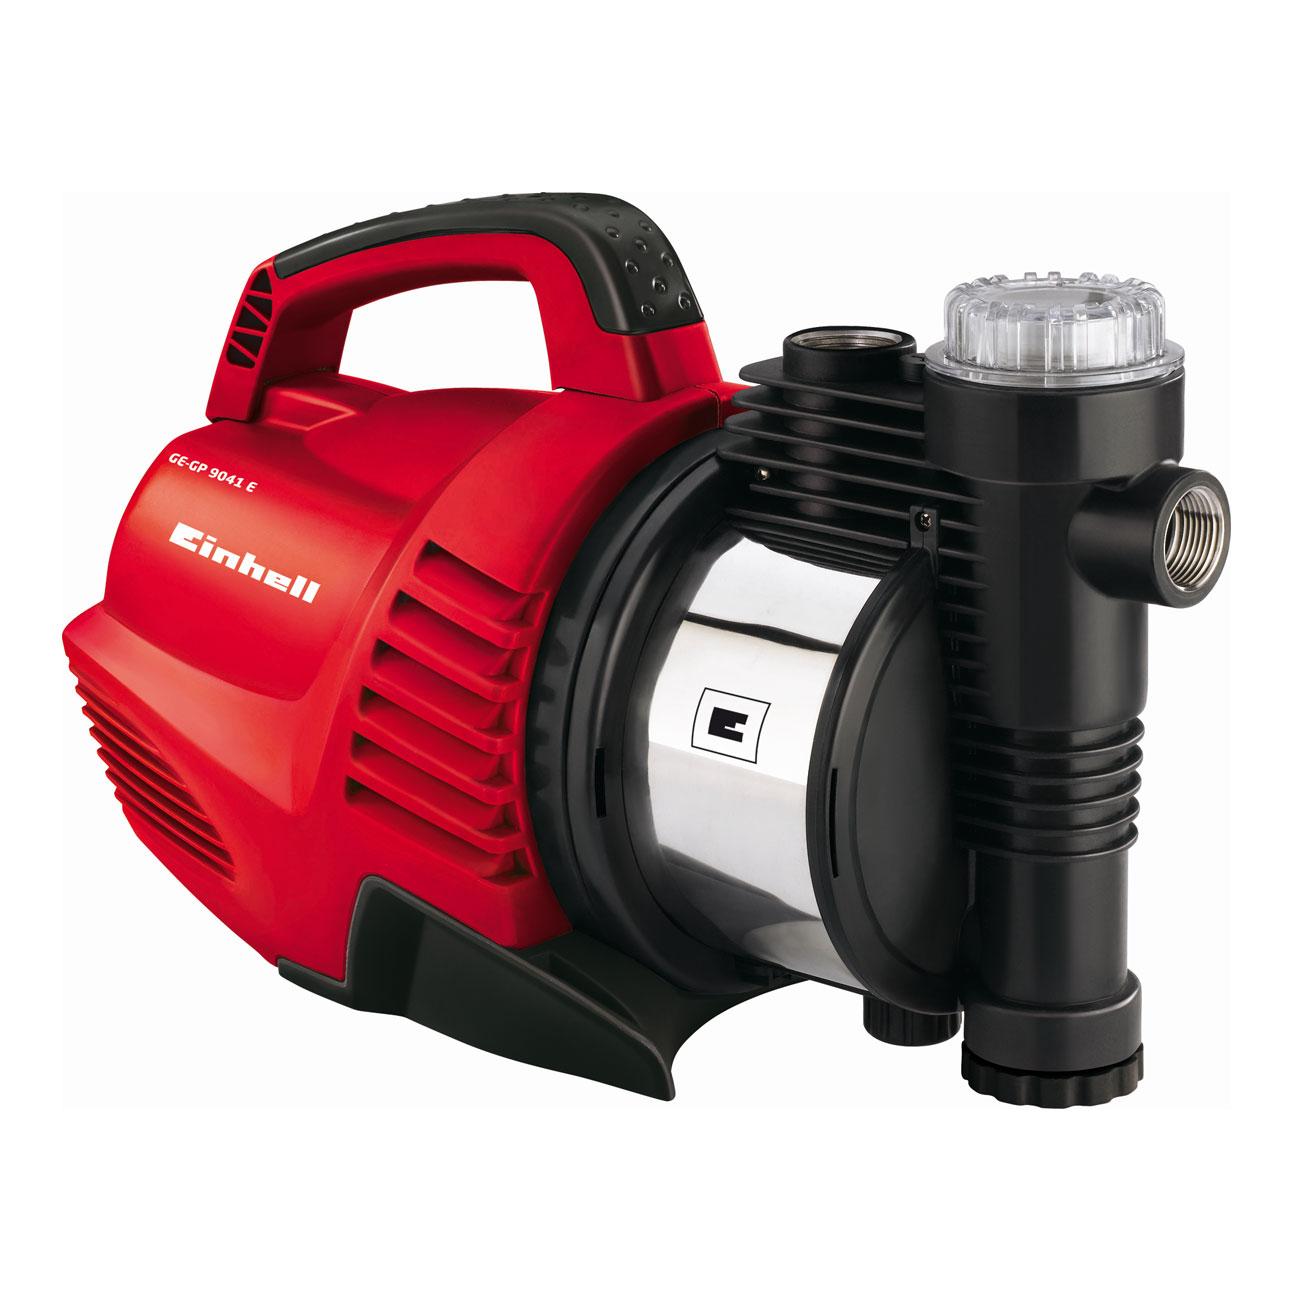 Einhell GE-GP 9041 E Electric Water Pump